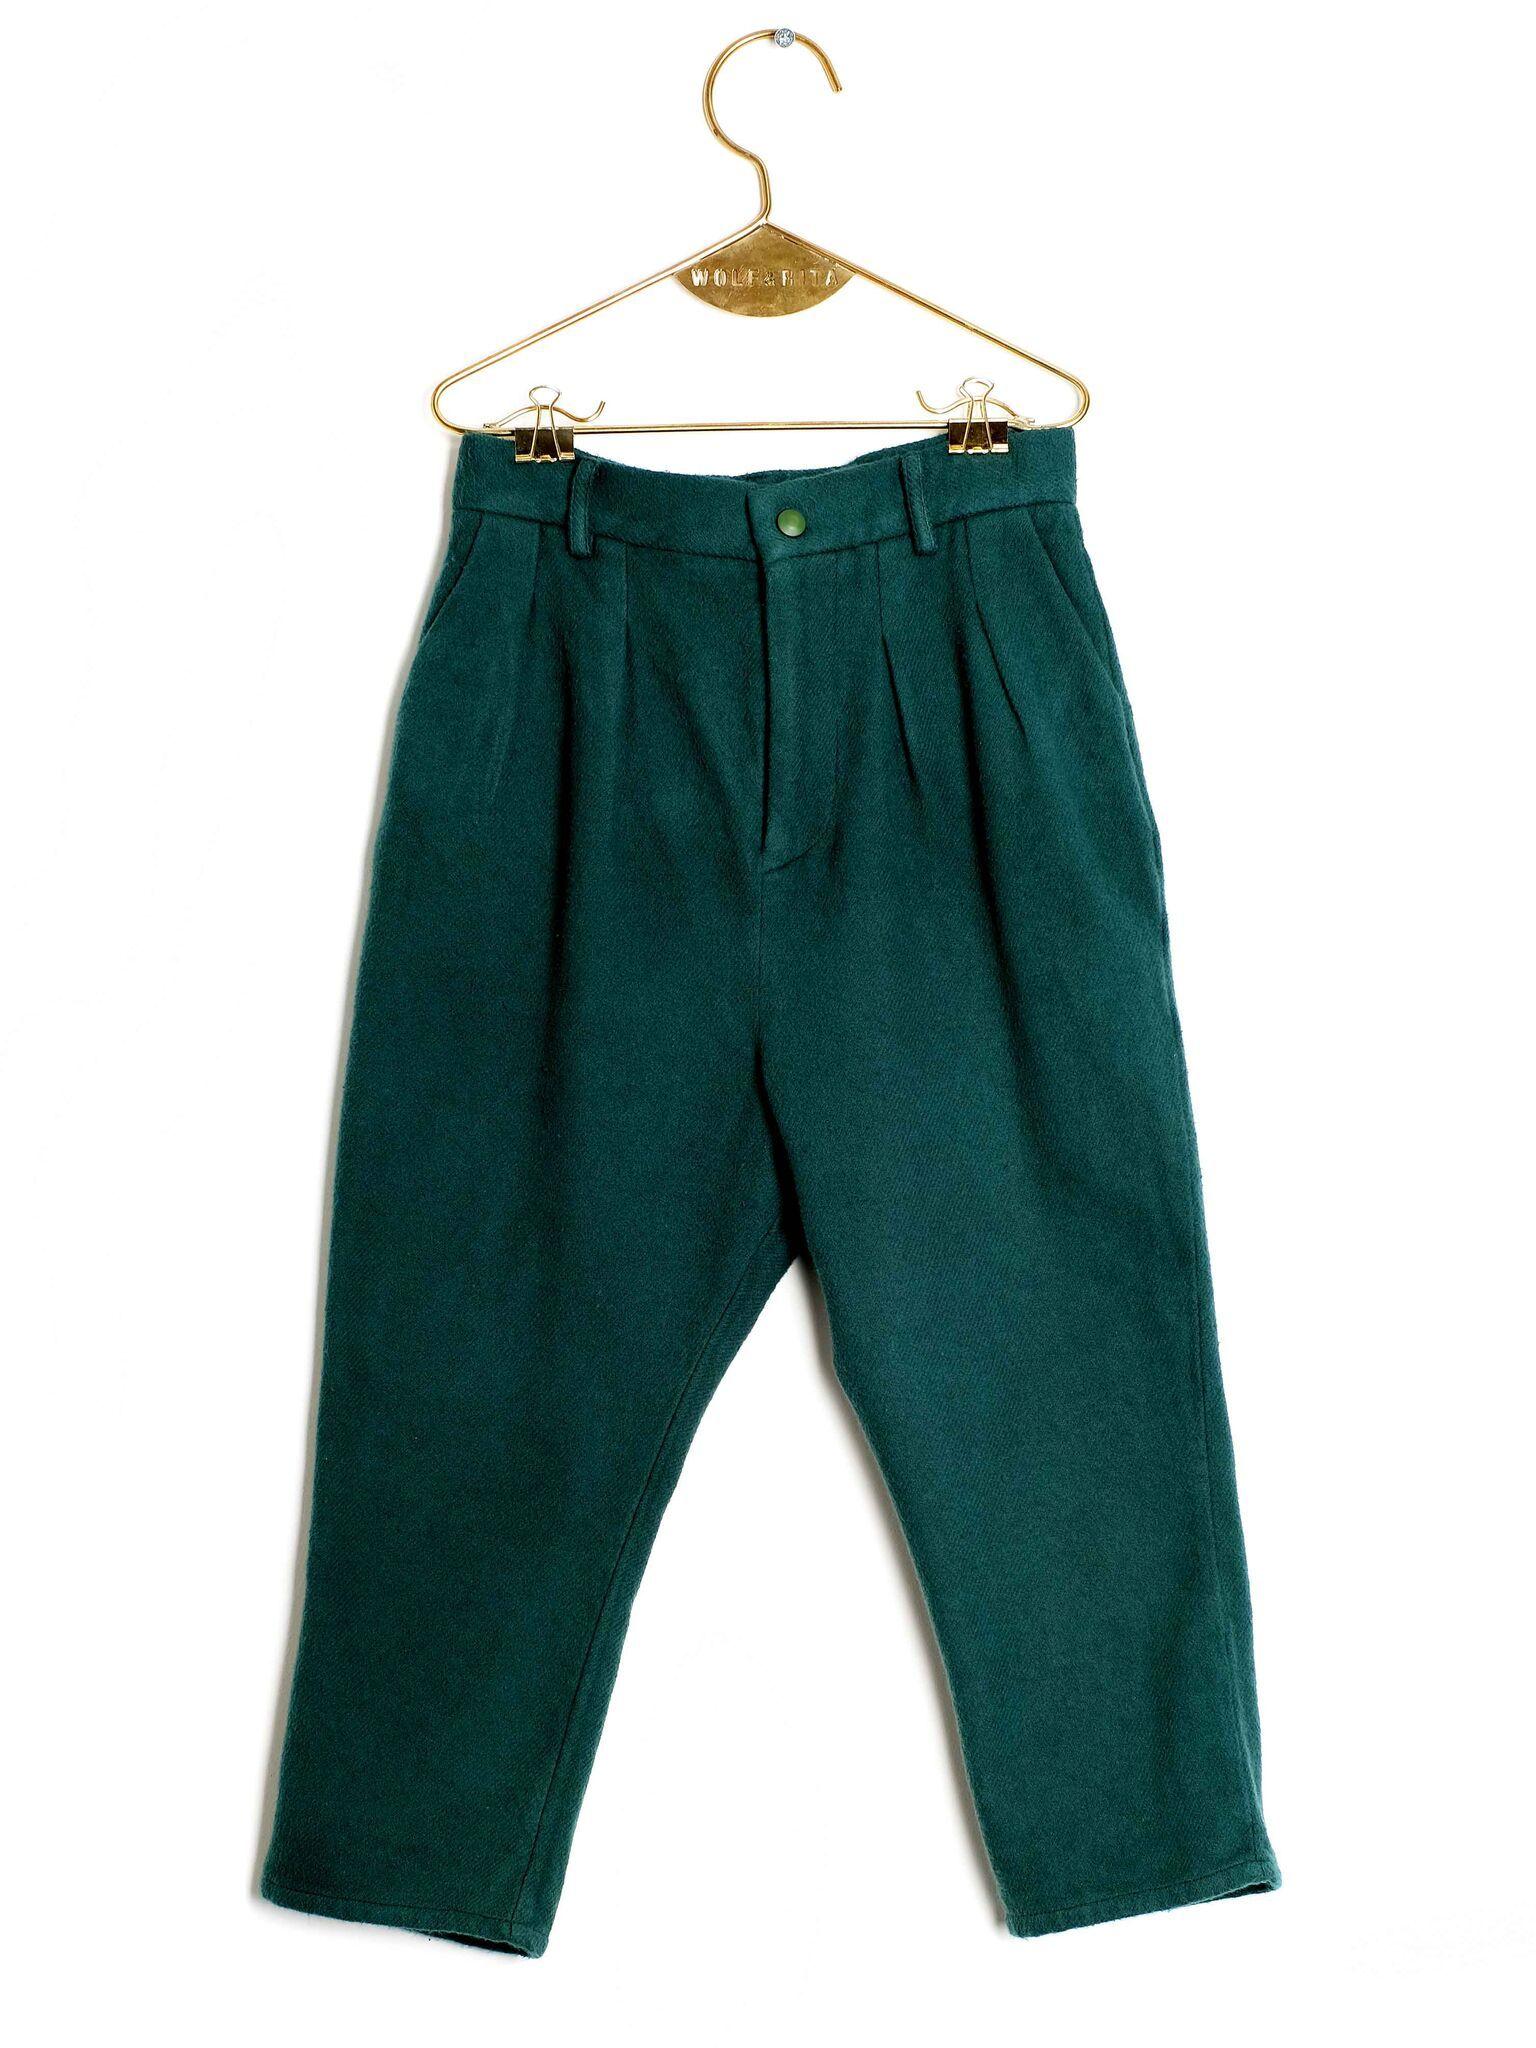 kodomo boston - wolf & rita andre boys trousers